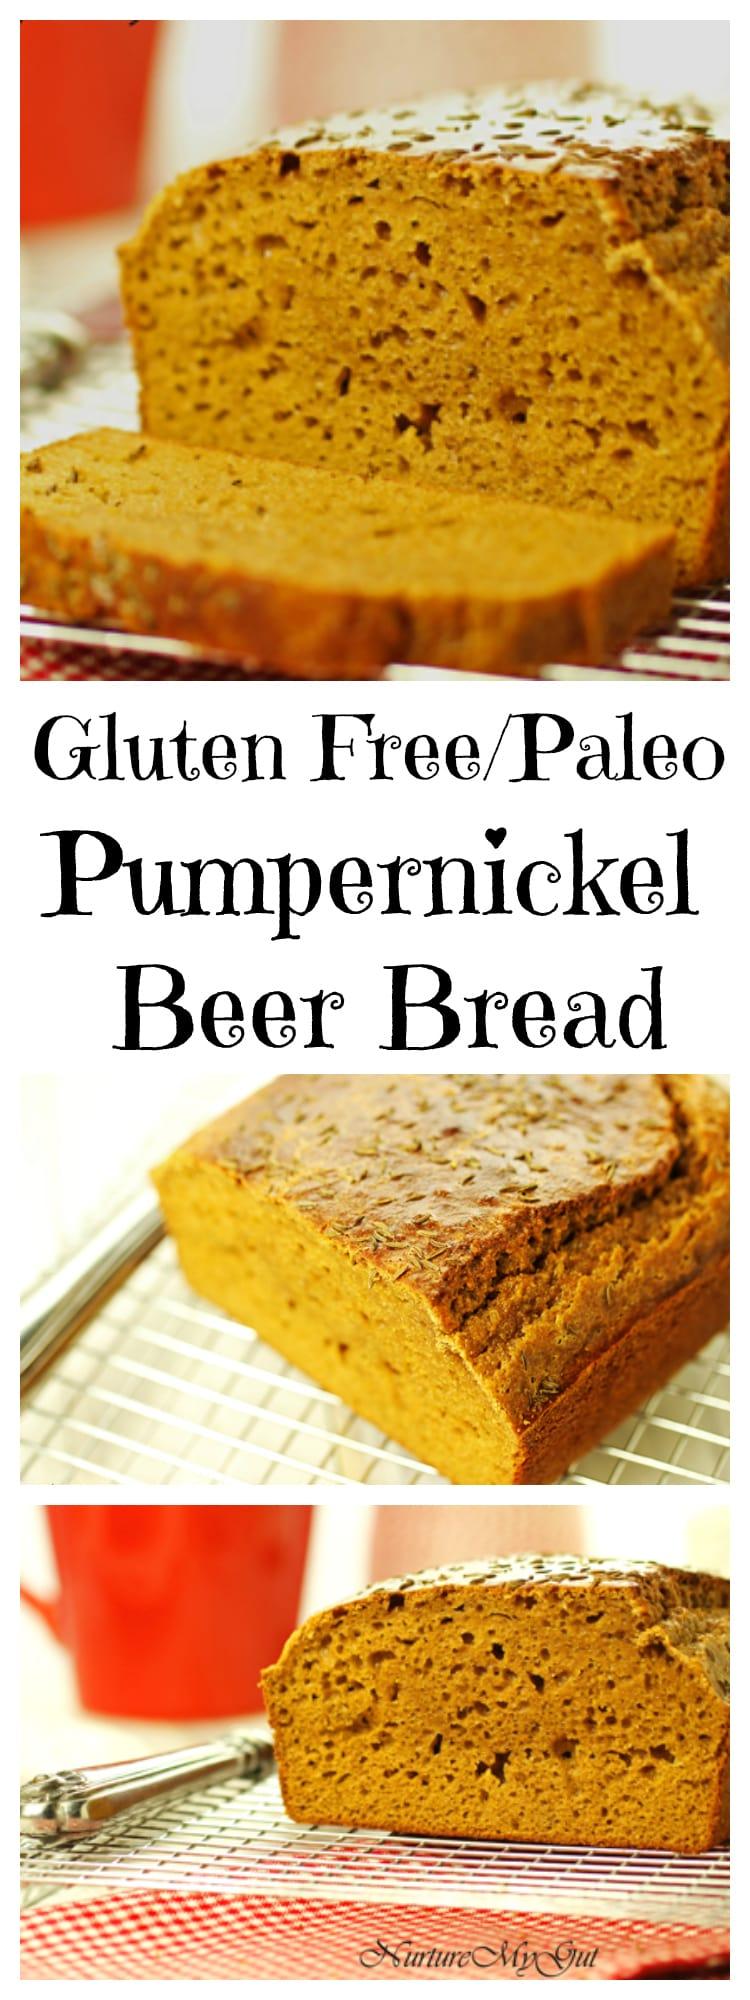 gluten free paleo pumpernickel beer bread